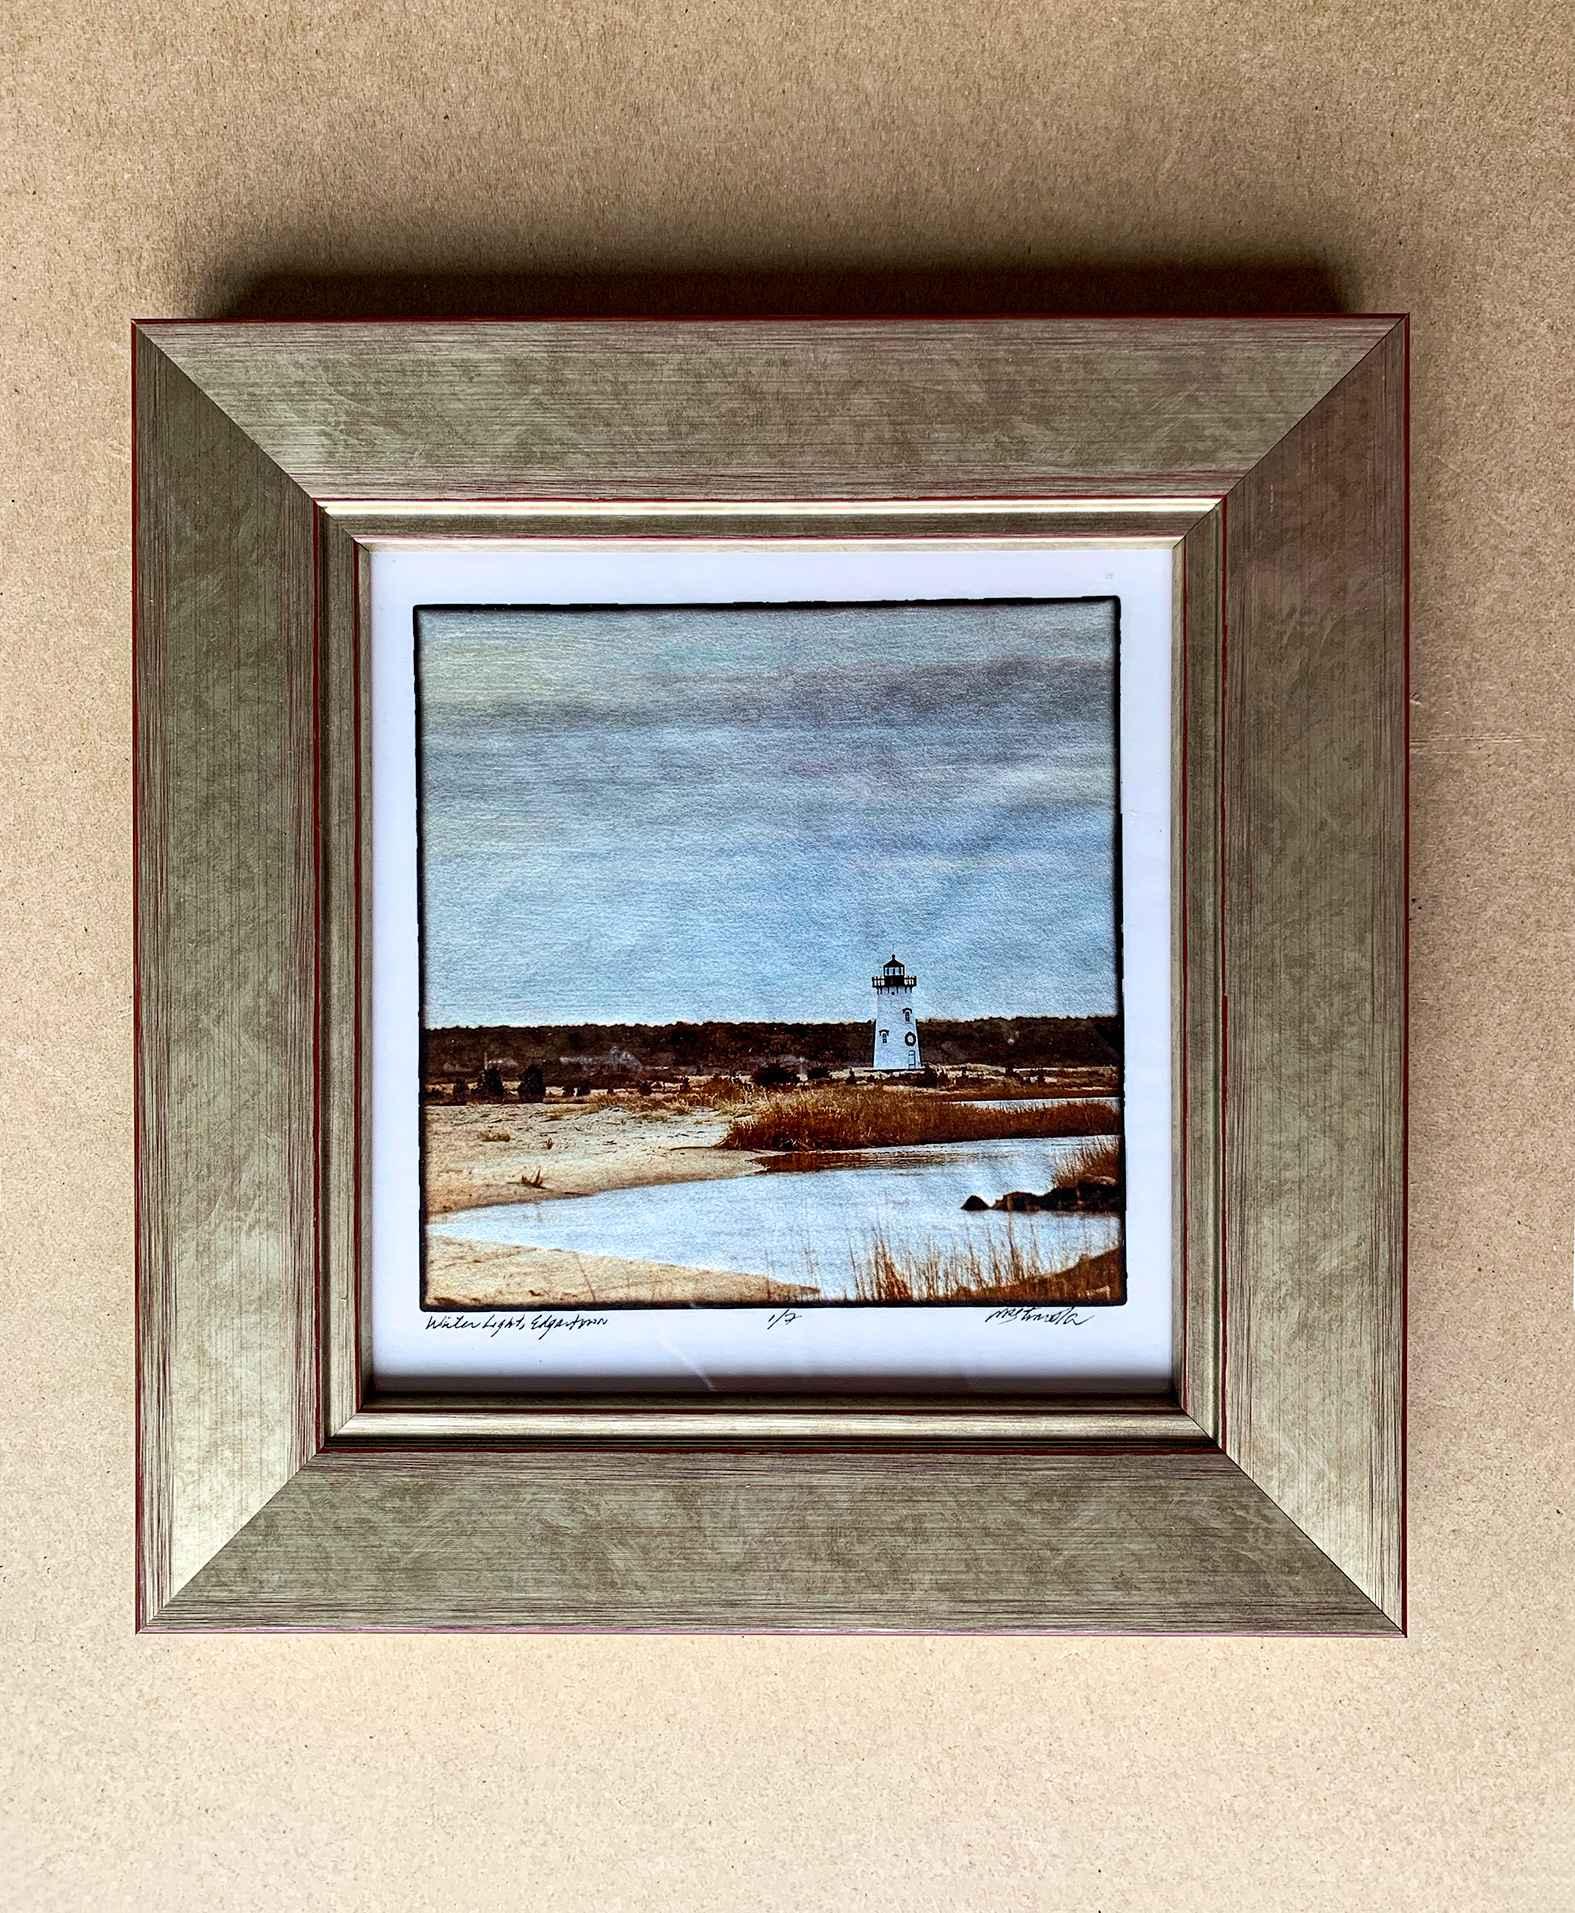 Winter Light, Edgarto... by  Michael Stimola - Masterpiece Online